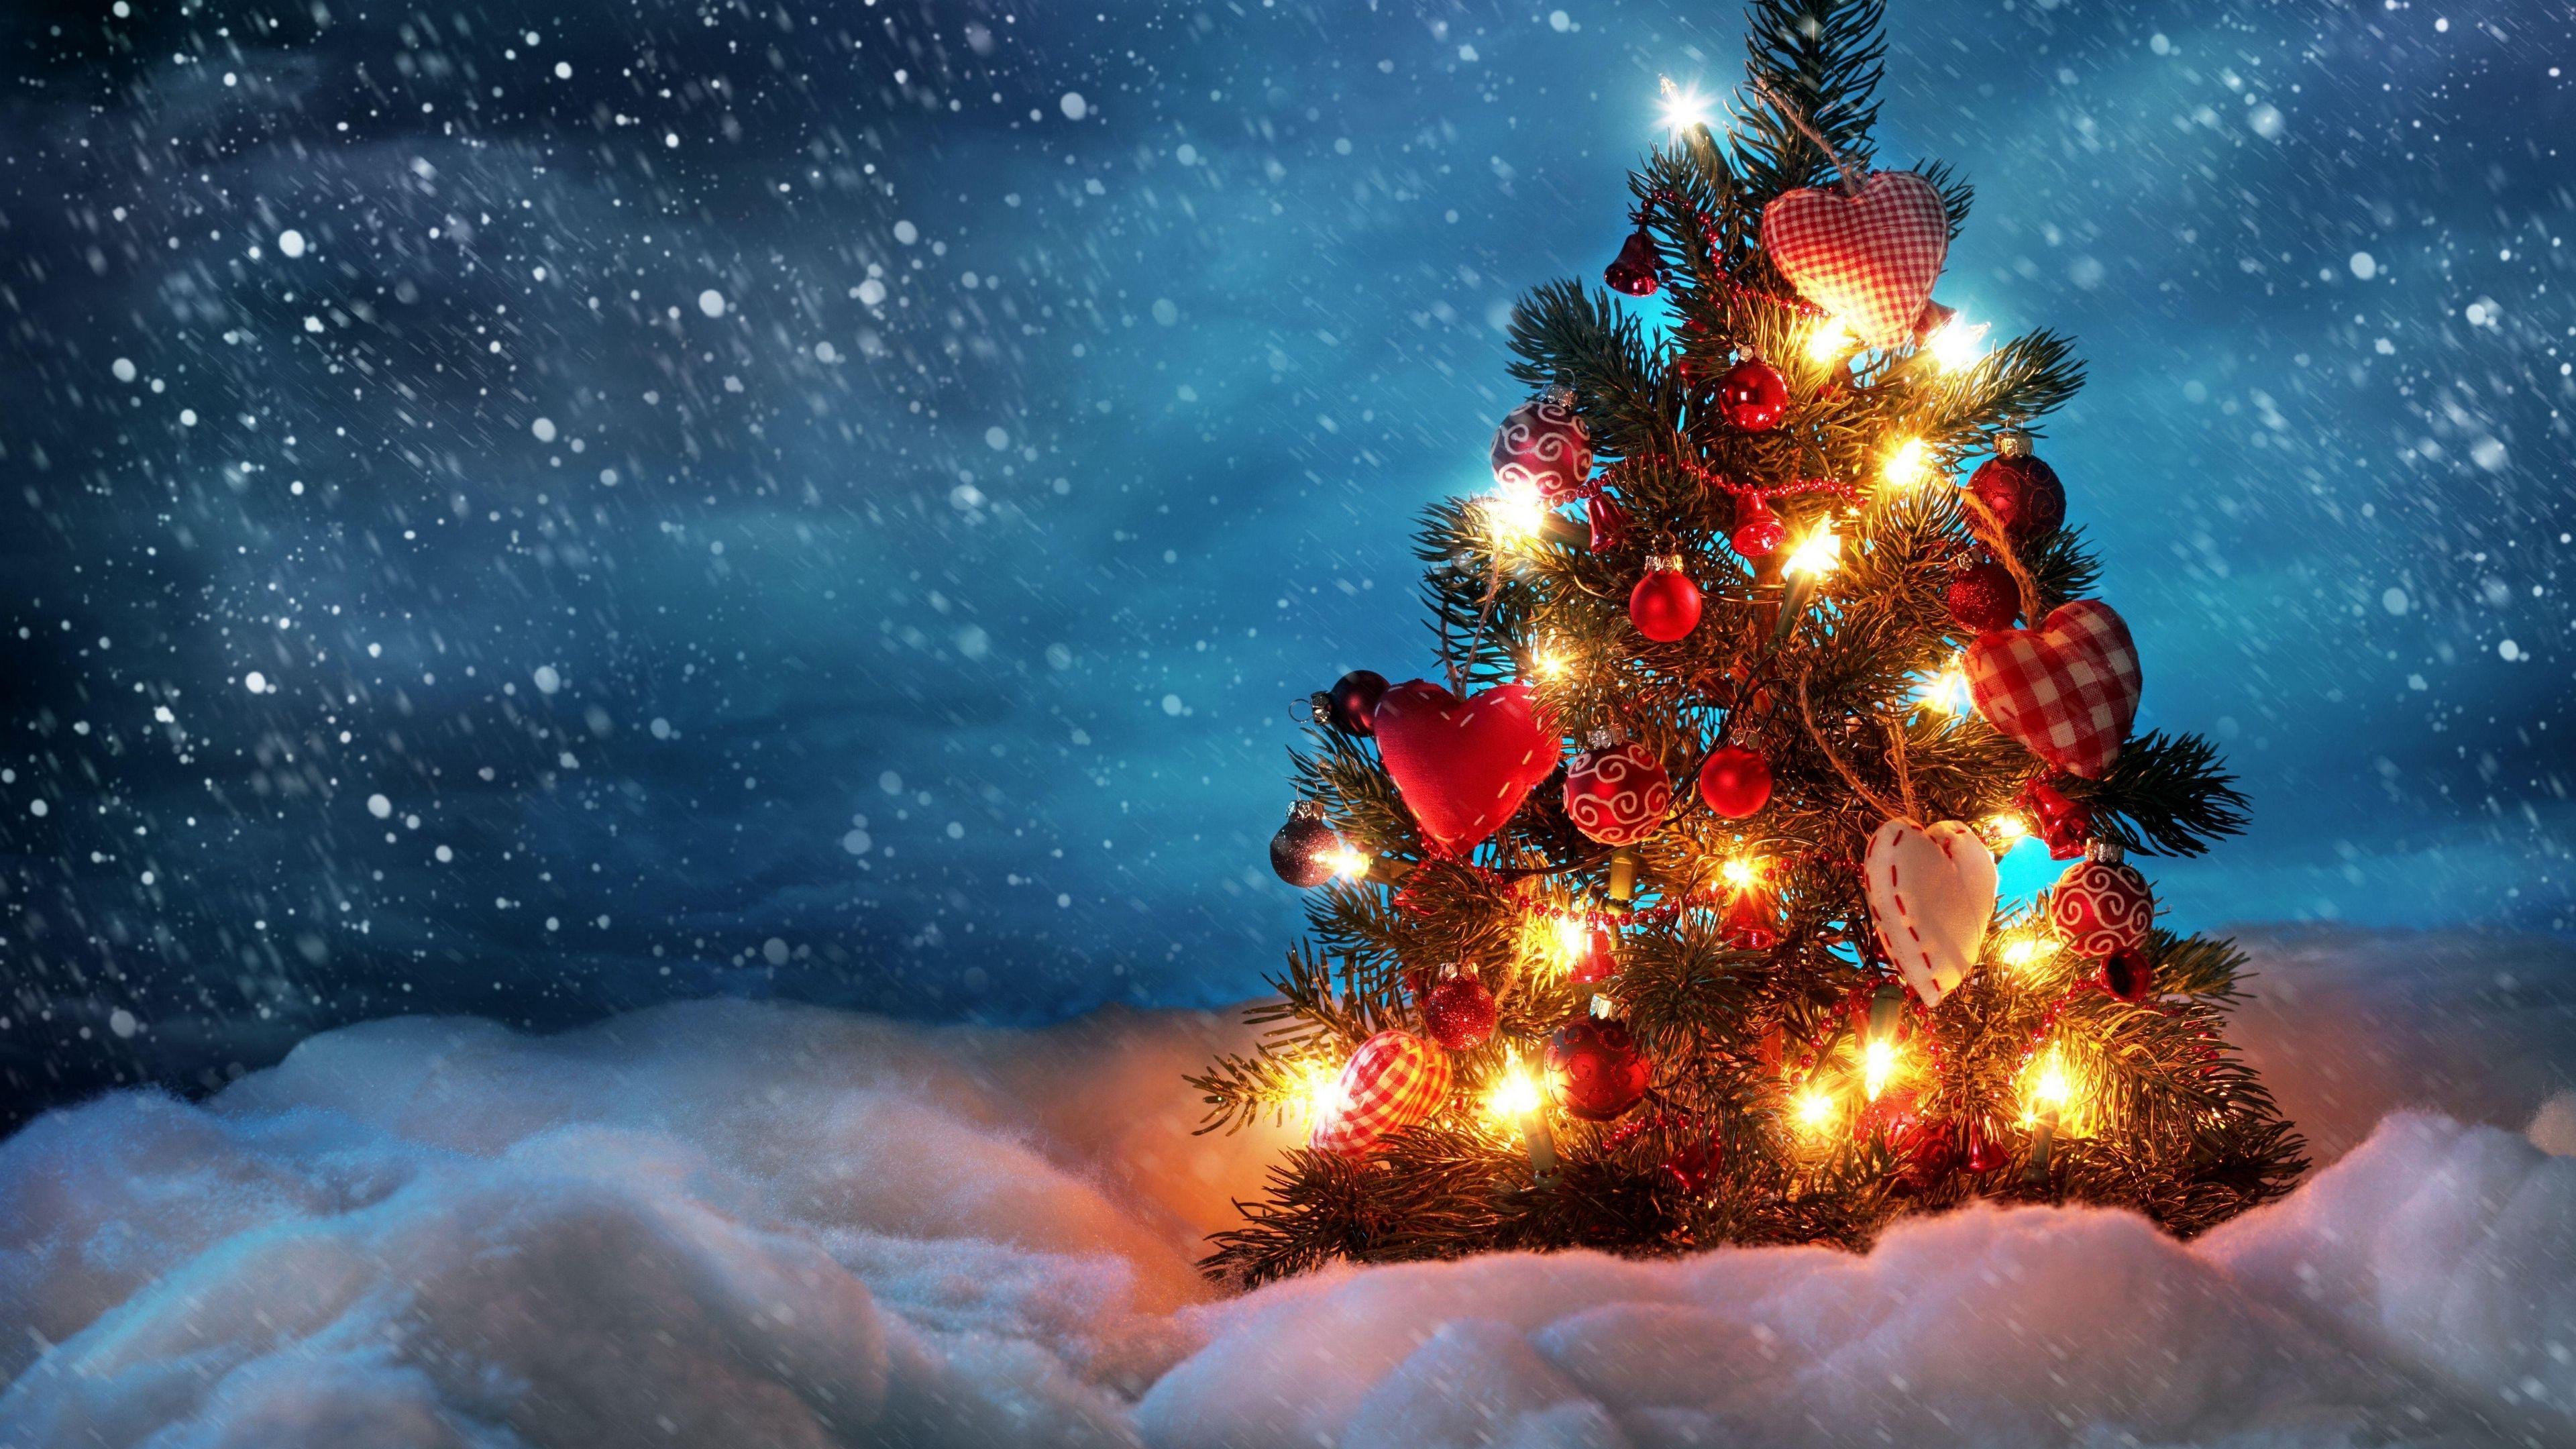 Christmas Tree Hd 4k Wallpapers - Wallpaper Cave